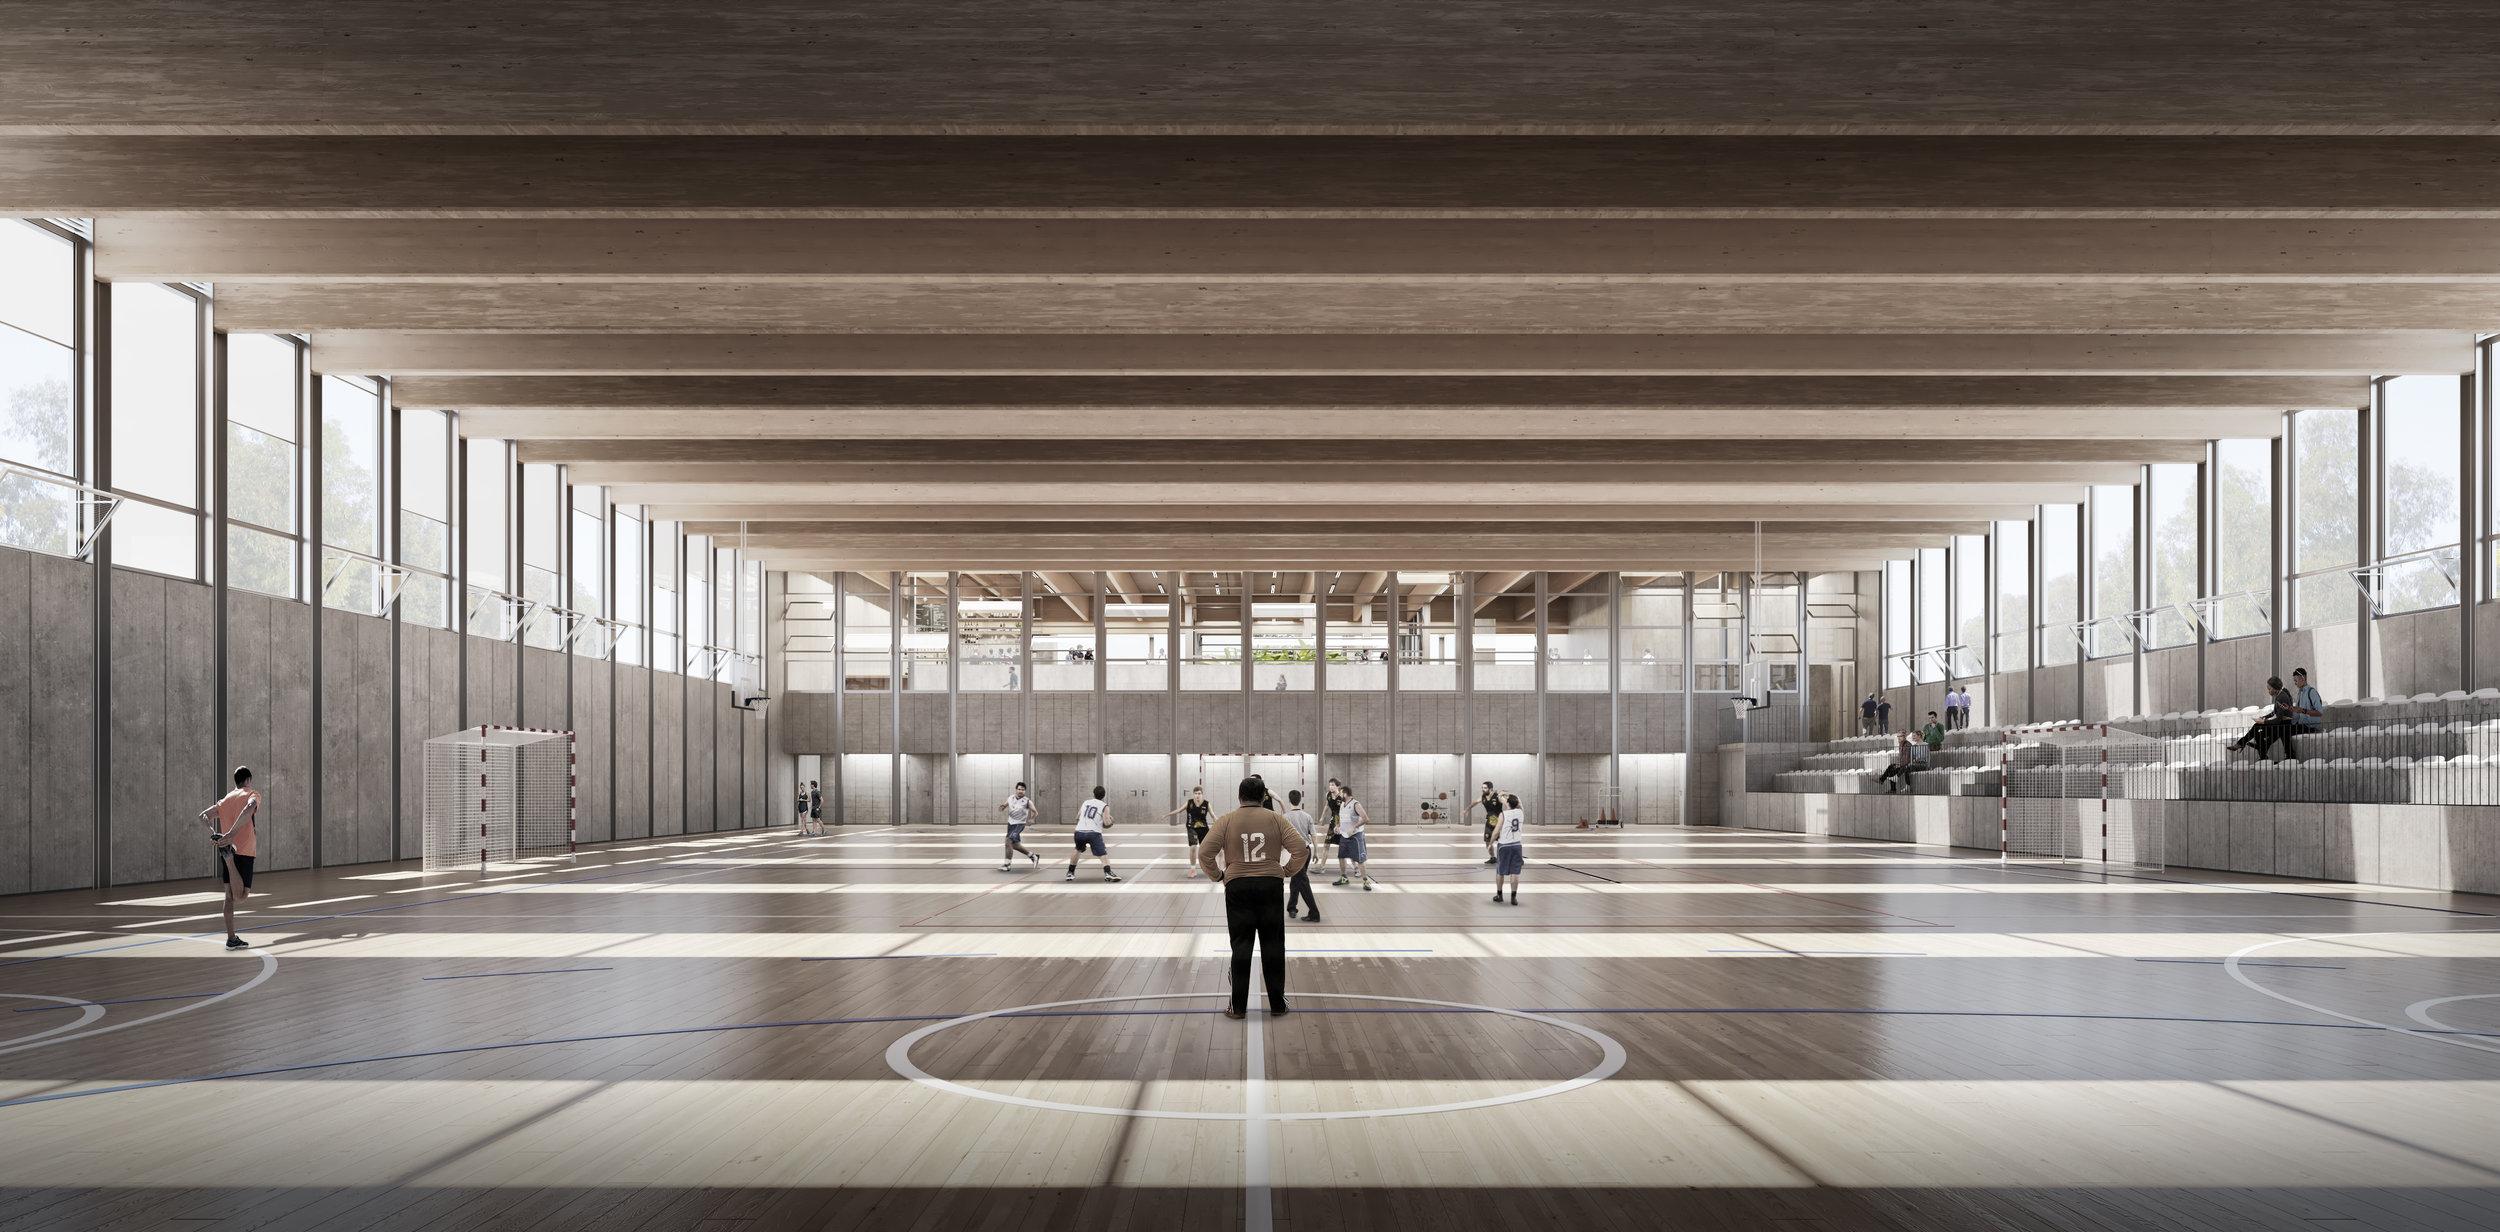 Polideportivo Espronceda |  Bosch.Capdeferro  Arquitectura | Barcelona, Spain